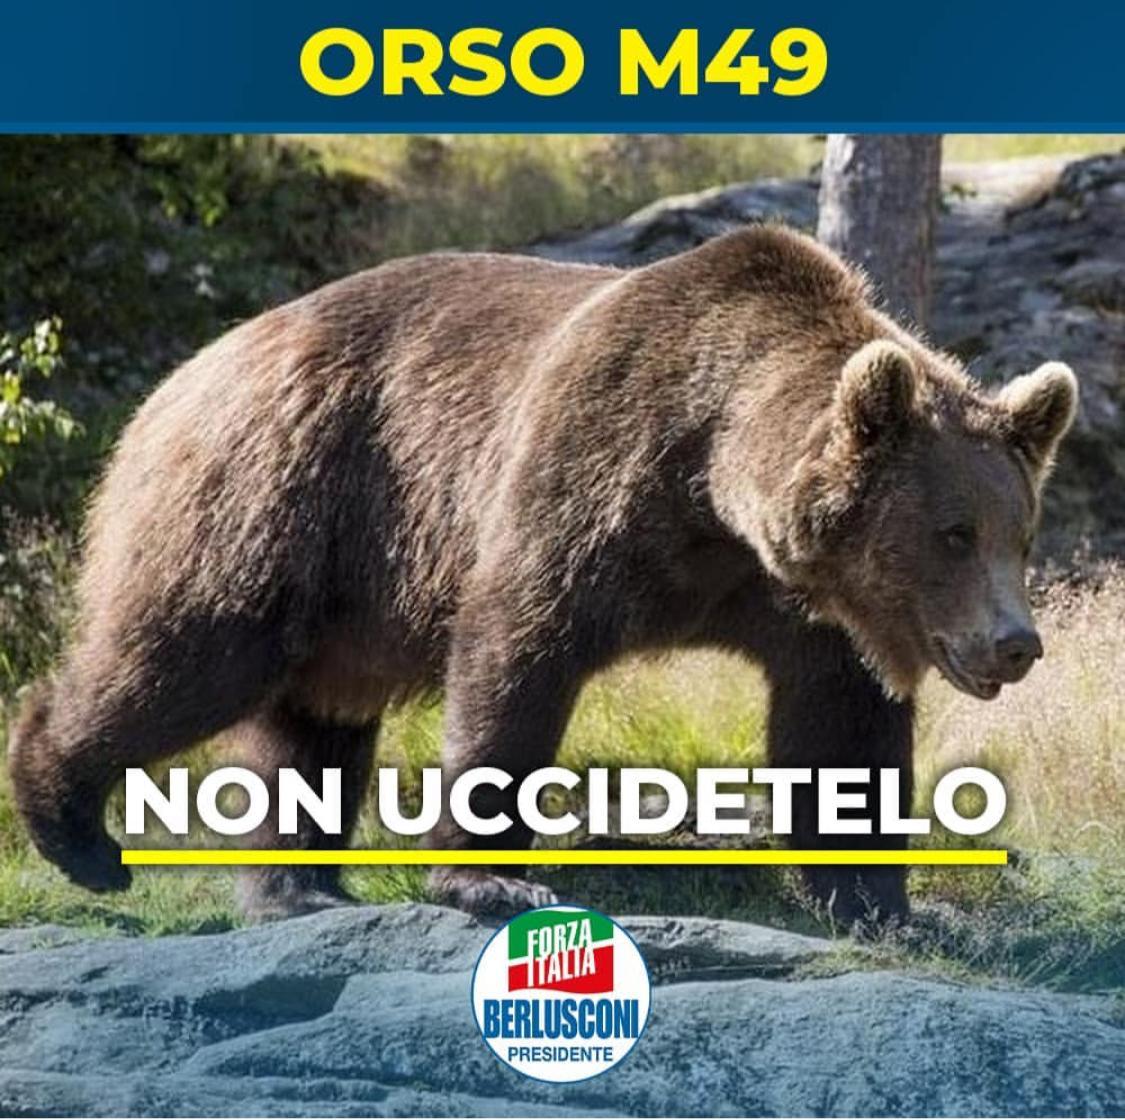 #orsoM49